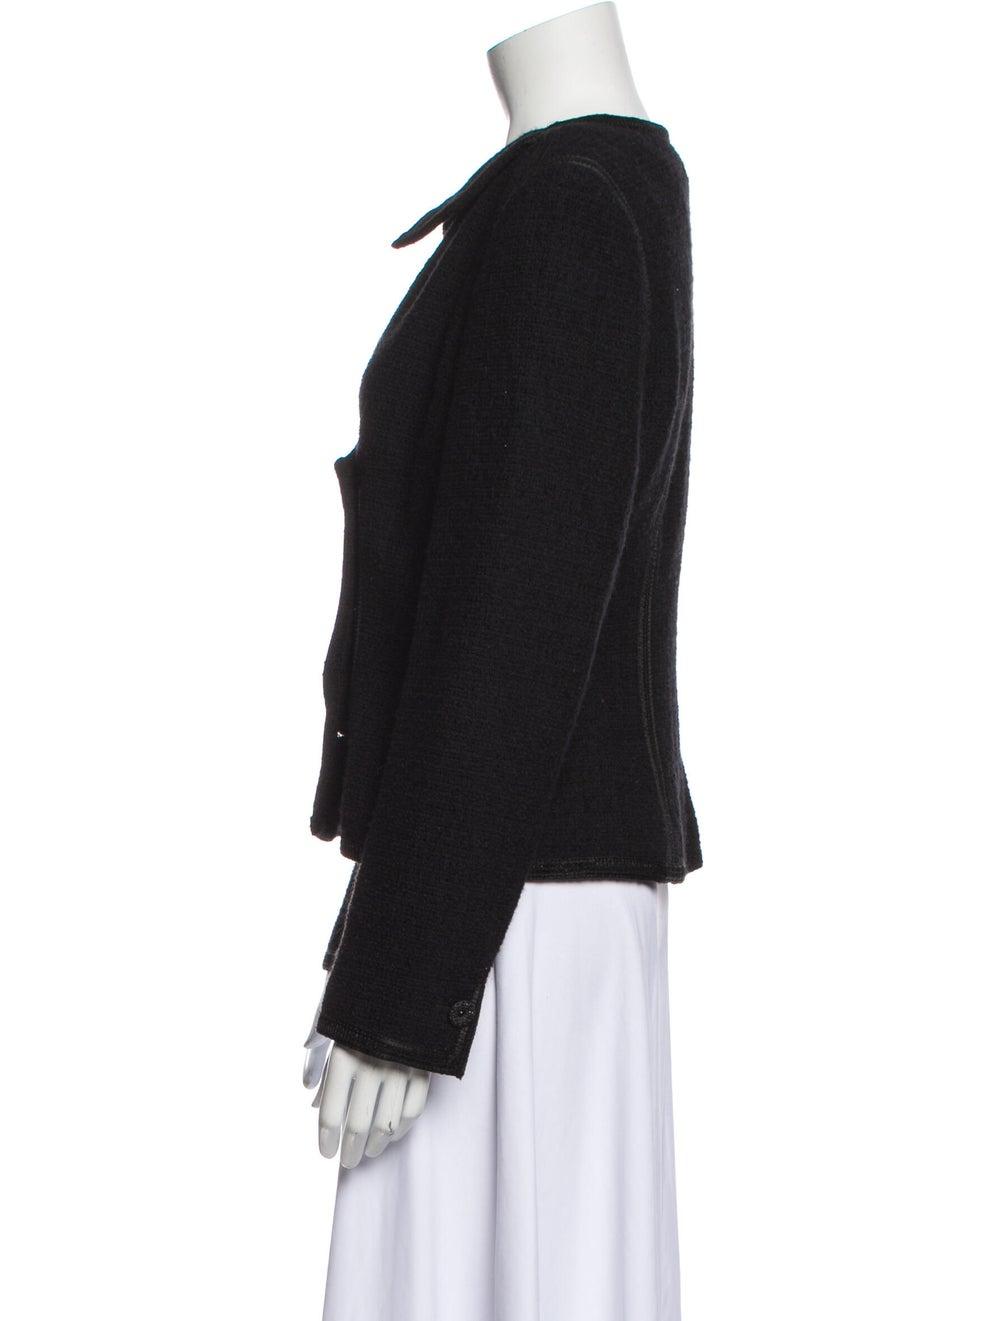 Chanel Vintage 2002 Evening Jacket Wool - image 2